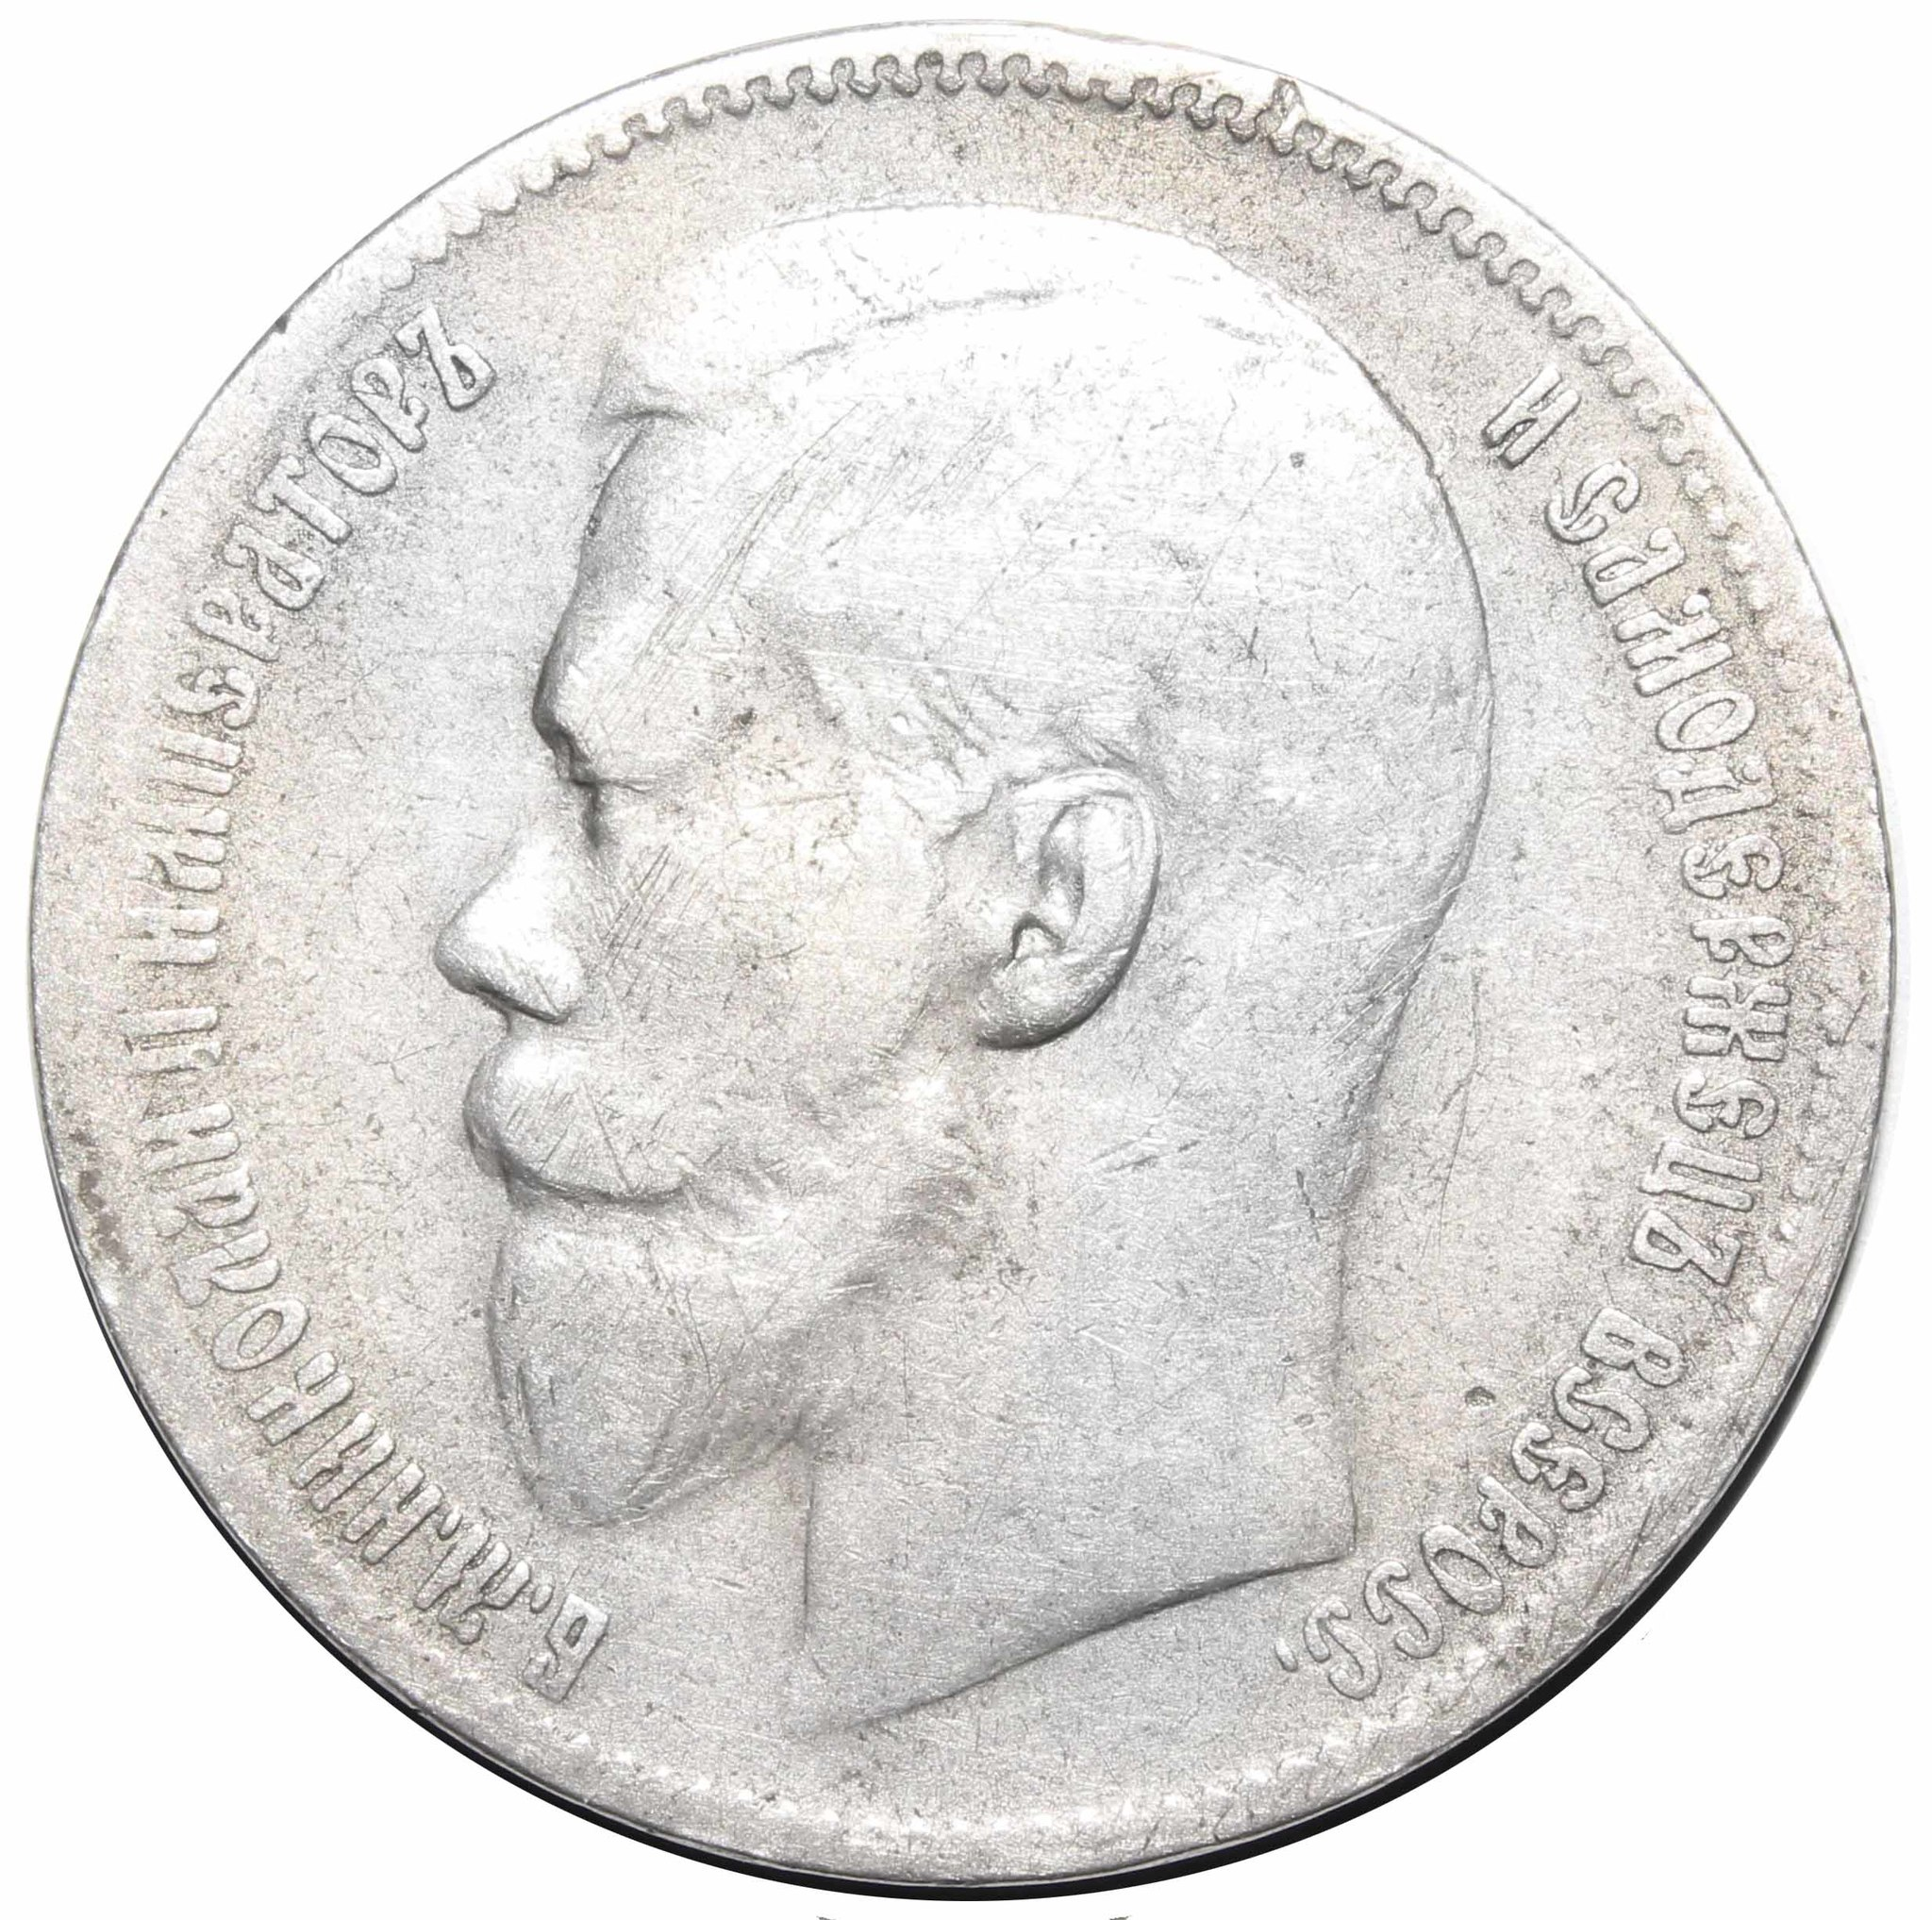 1 рубль. Николай II. (**). 1897 год. VF